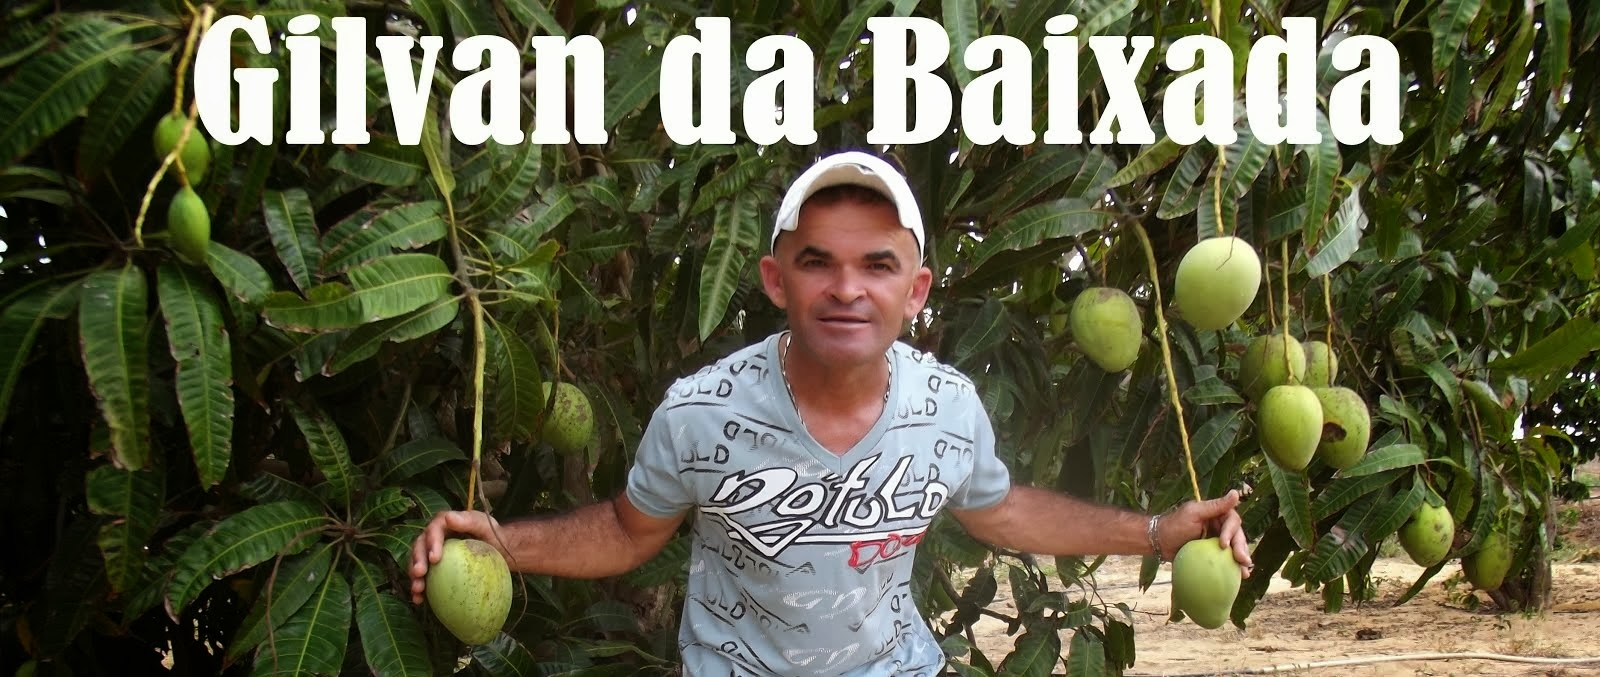 GILVAN DA BAIXADA